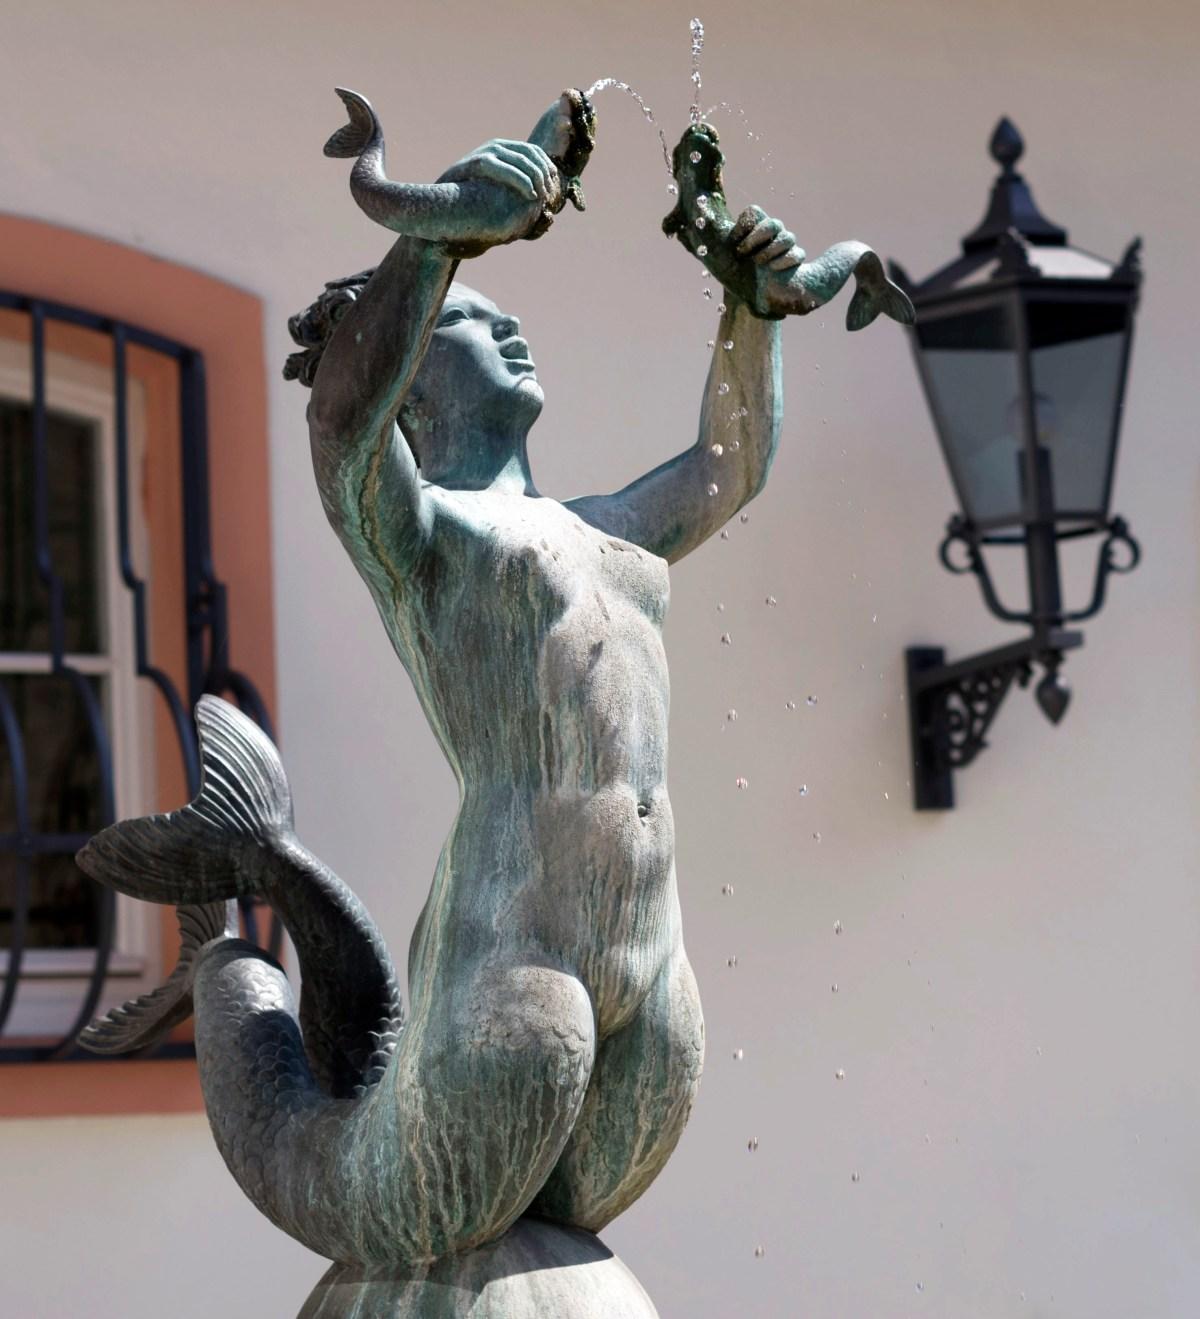 Mainz Mermaid sculpture